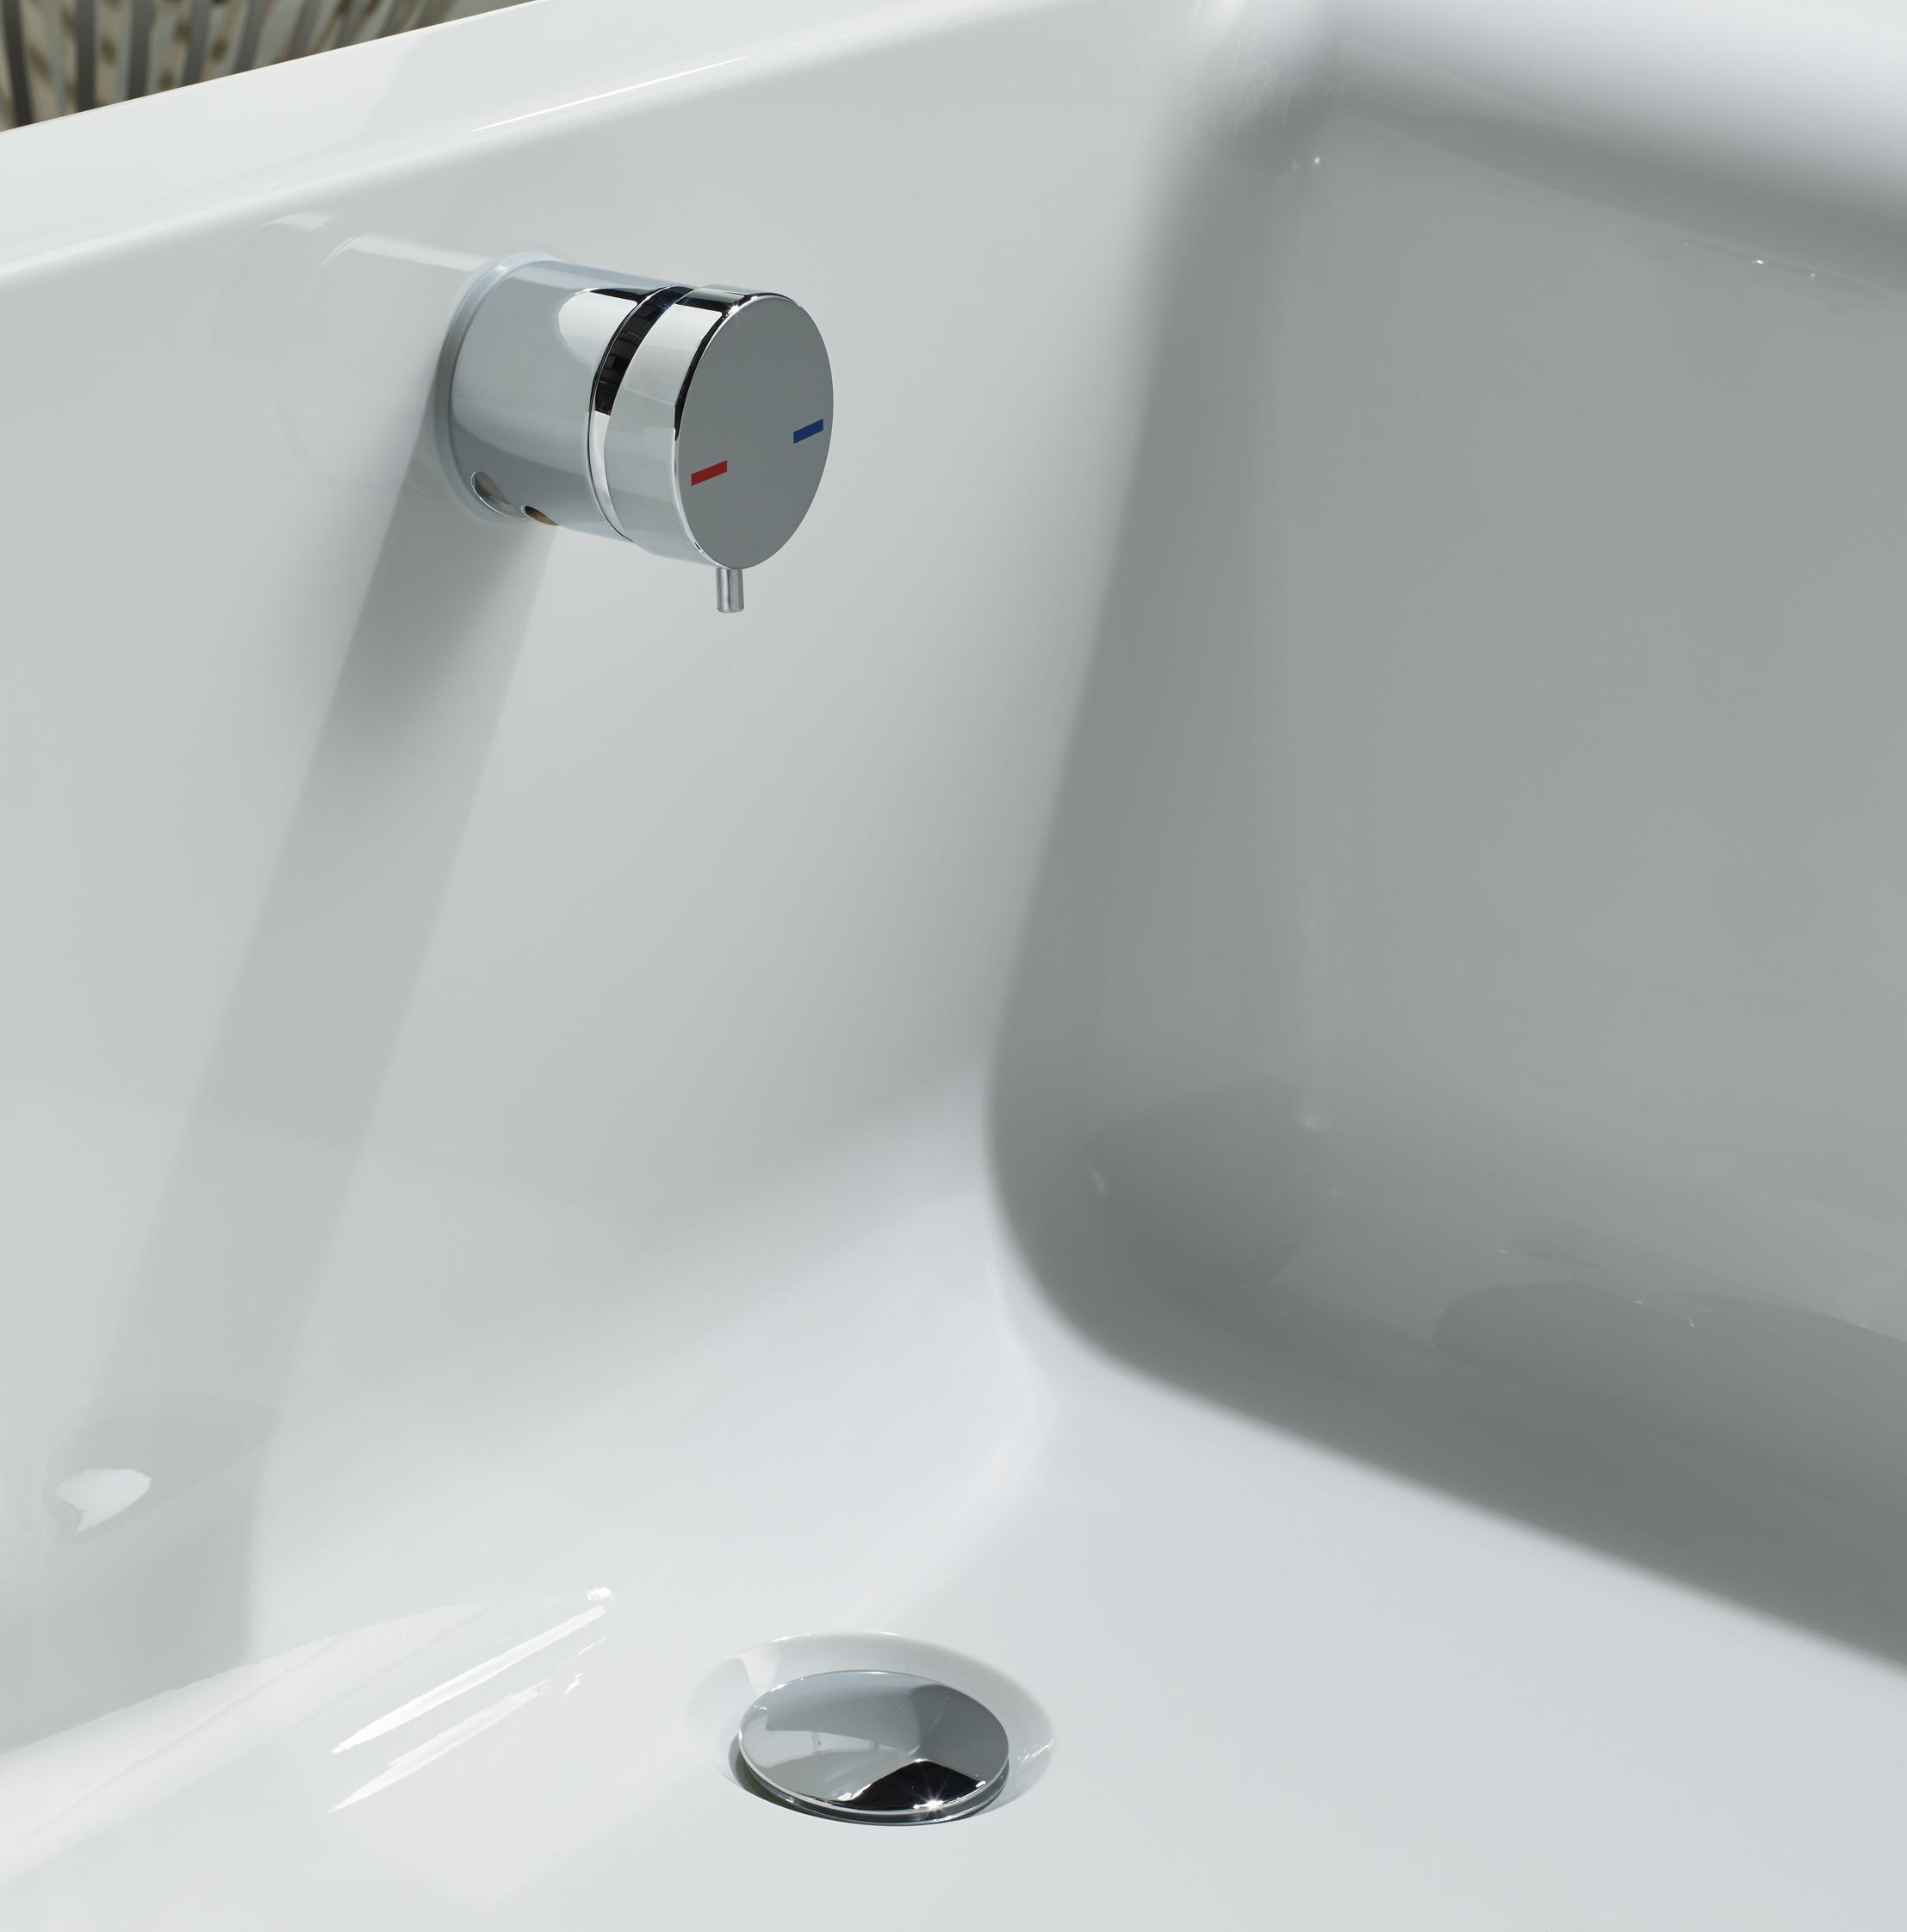 Bath Taps Shower Mixer Selkirk Overflow Bath Filler Bath Giant